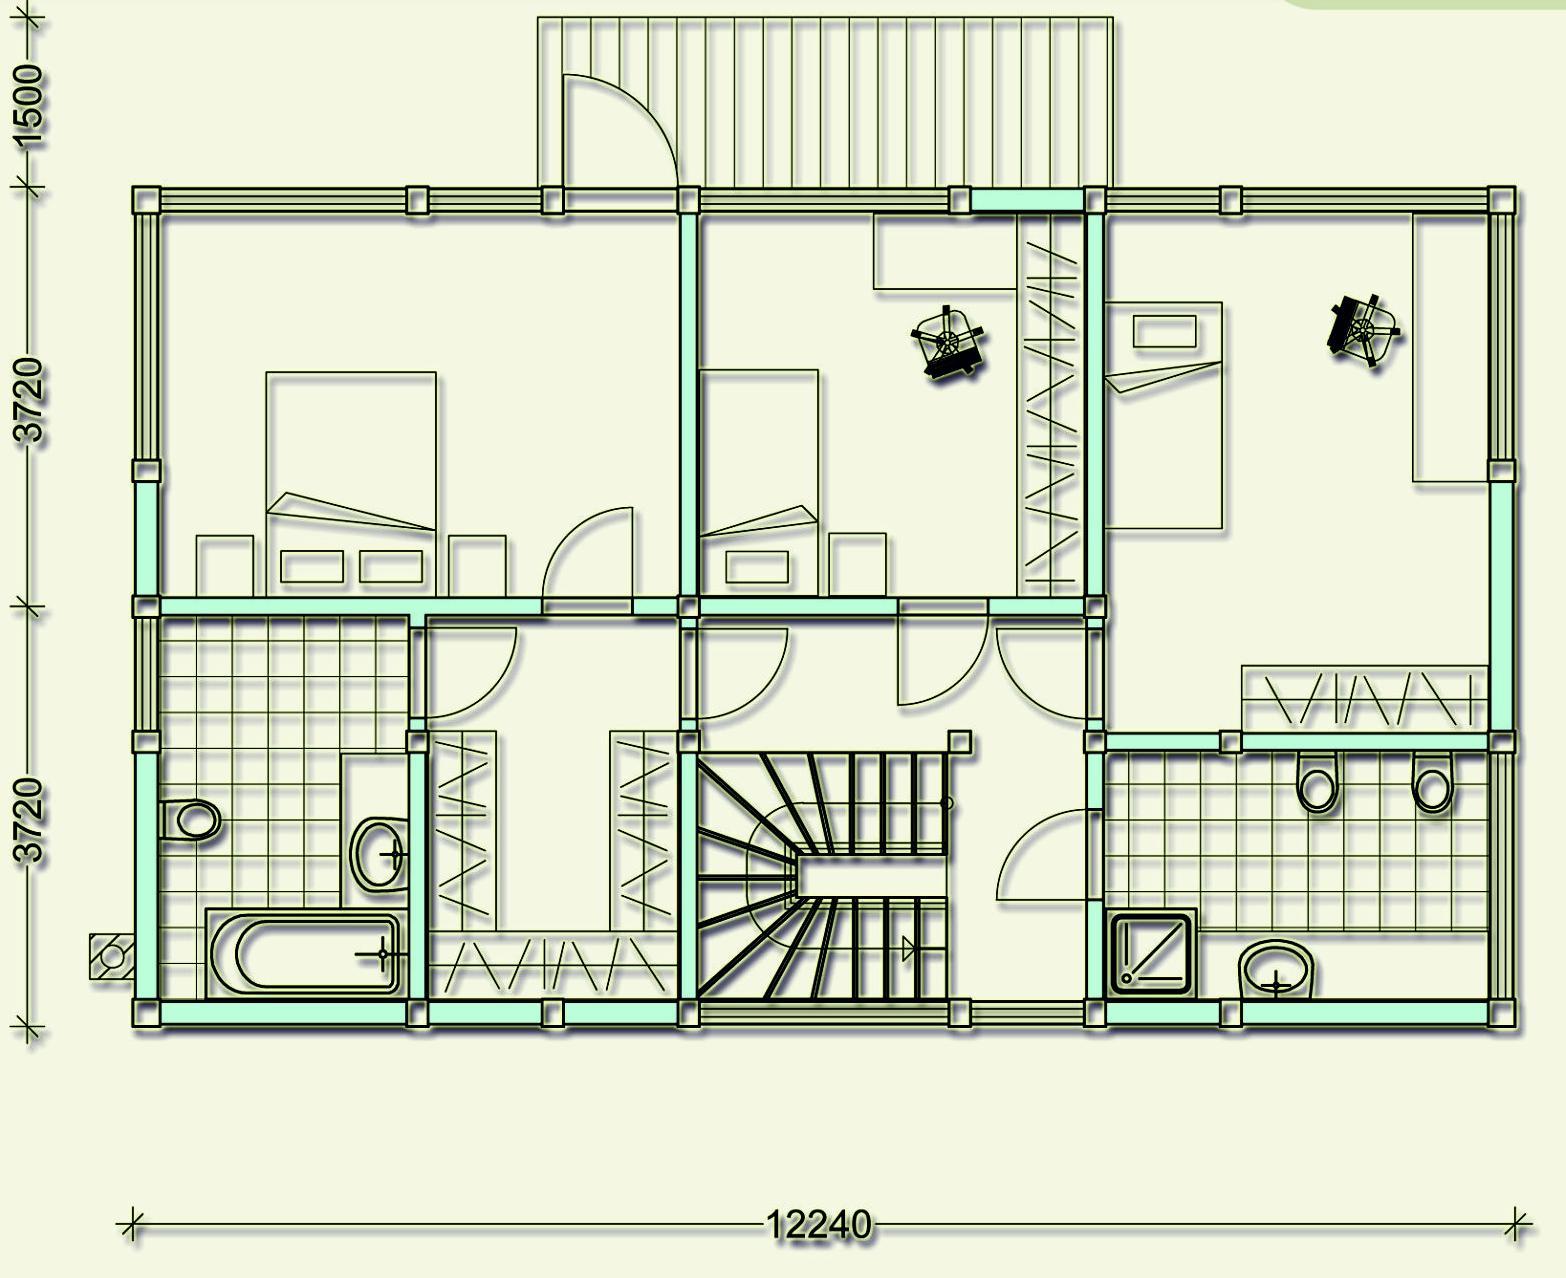 Проект фахверкового коттеджа MCF180 - план первого этажа